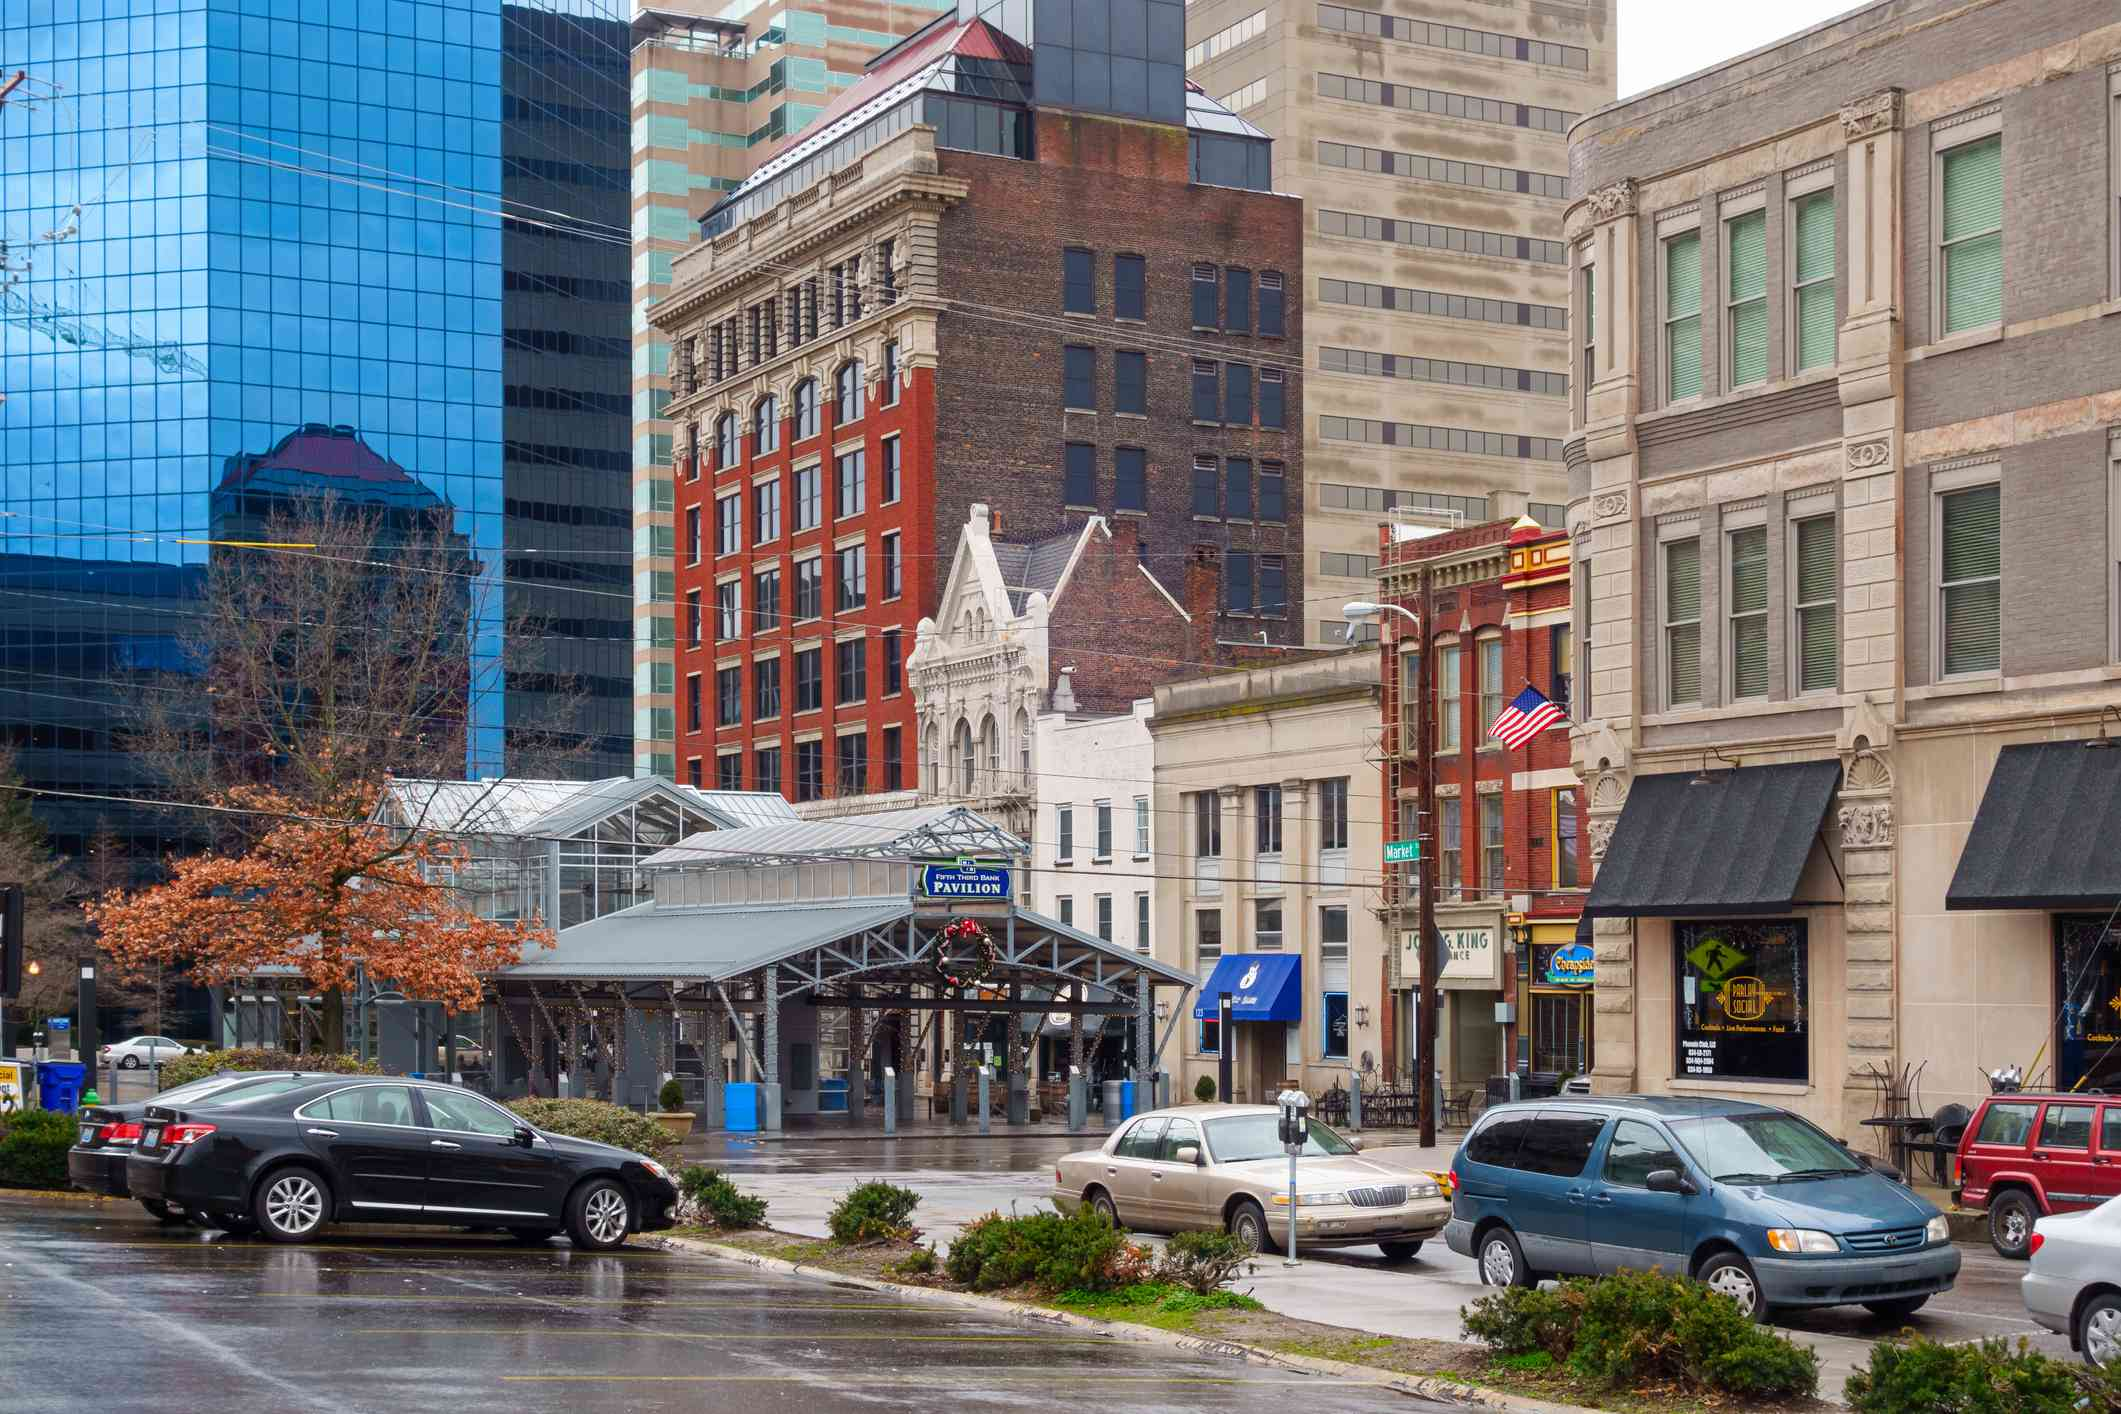 Downtown Lexington Kentucky USA